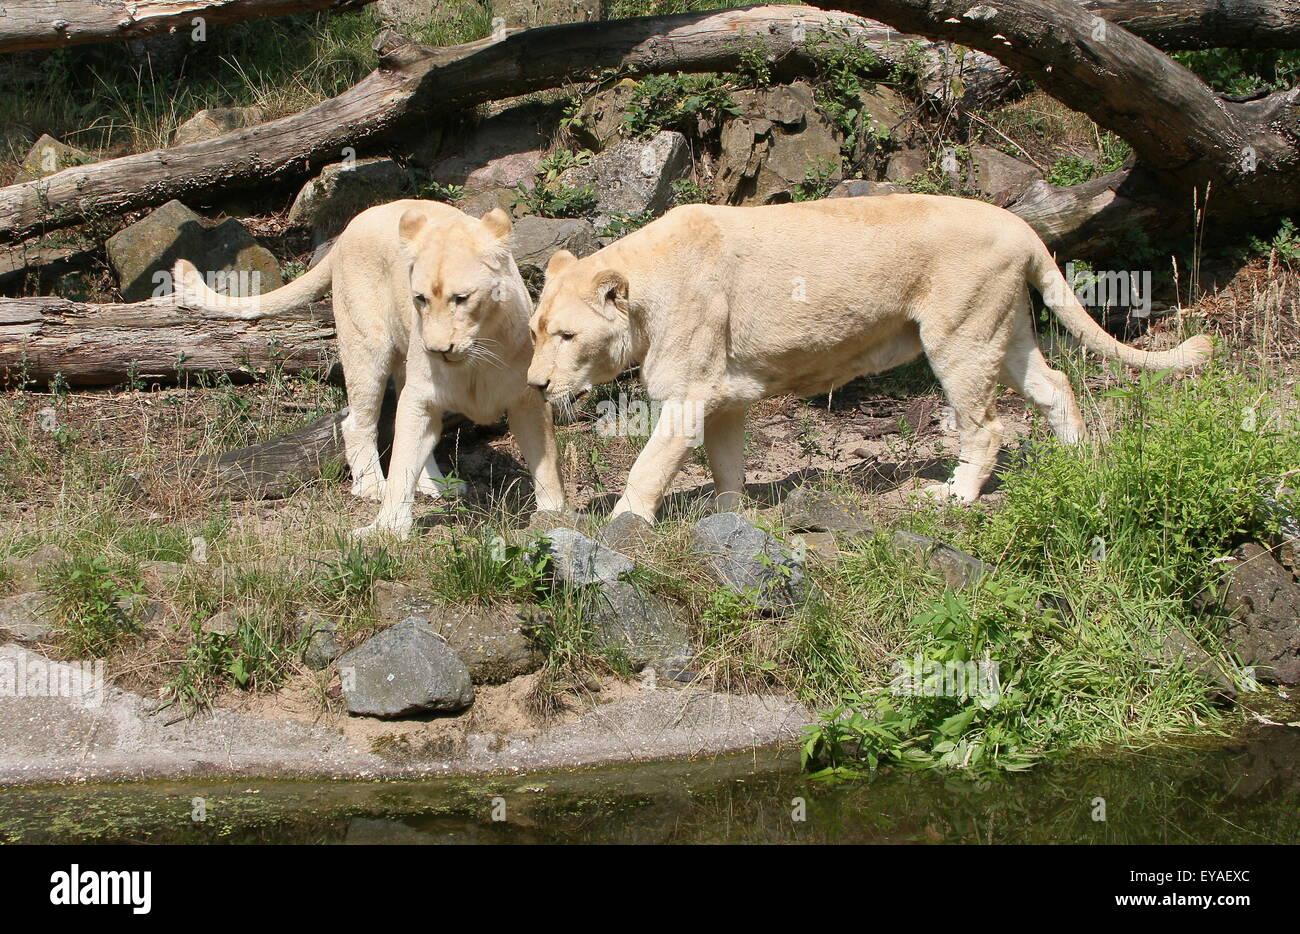 Par de leones blancos de Menores (Panthera leo Krugeri) Foto de stock